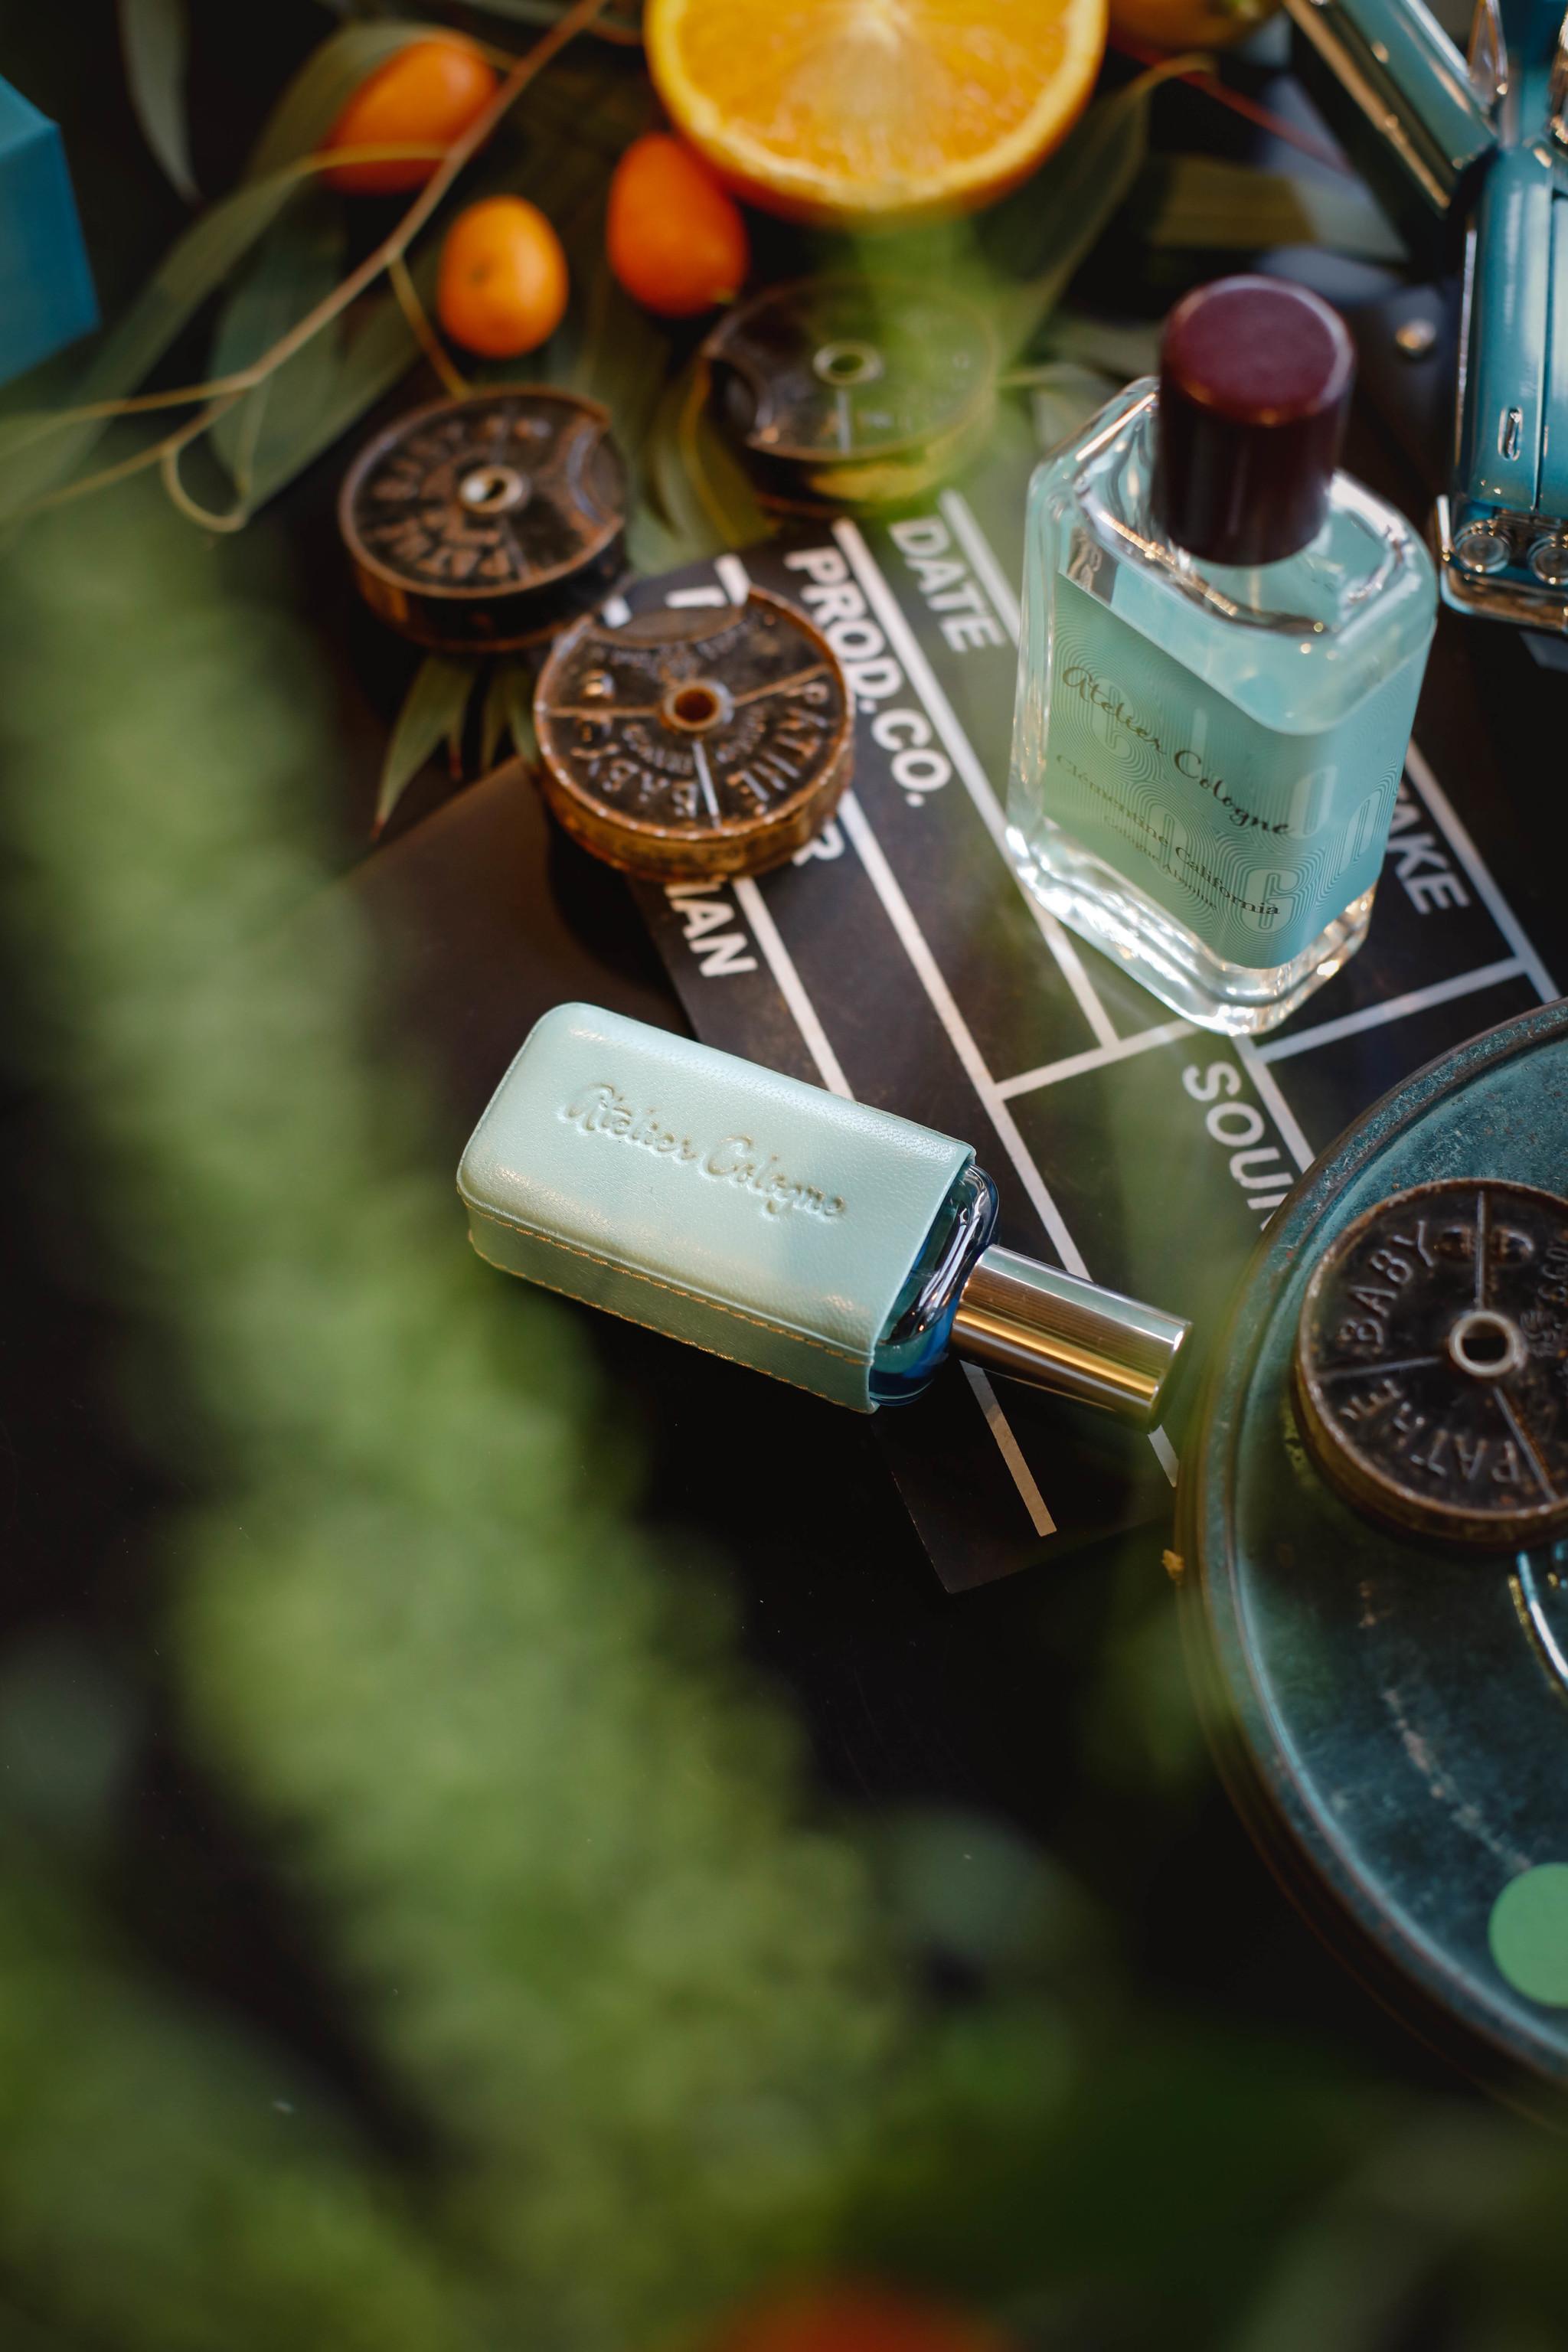 Atelier Cologne beauty talk, descubre el universo de la deliciosa firma francesa